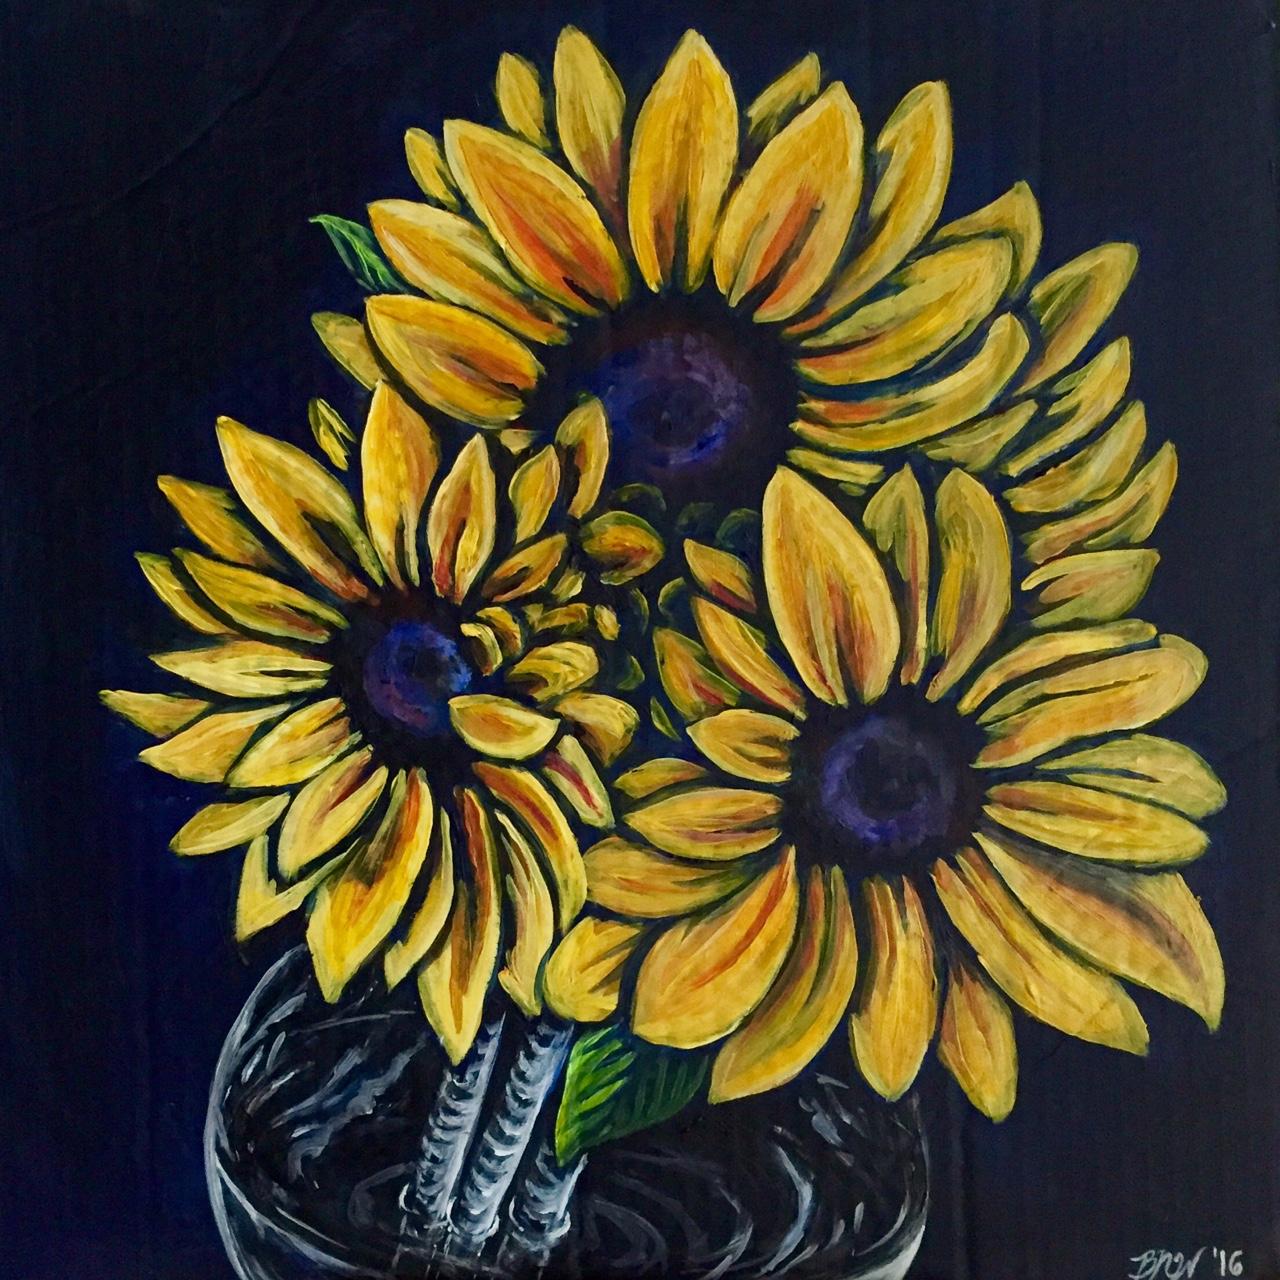 Sunflower Nights  - SOLD   2016. Acrylic on cardboard. 18 x 18.